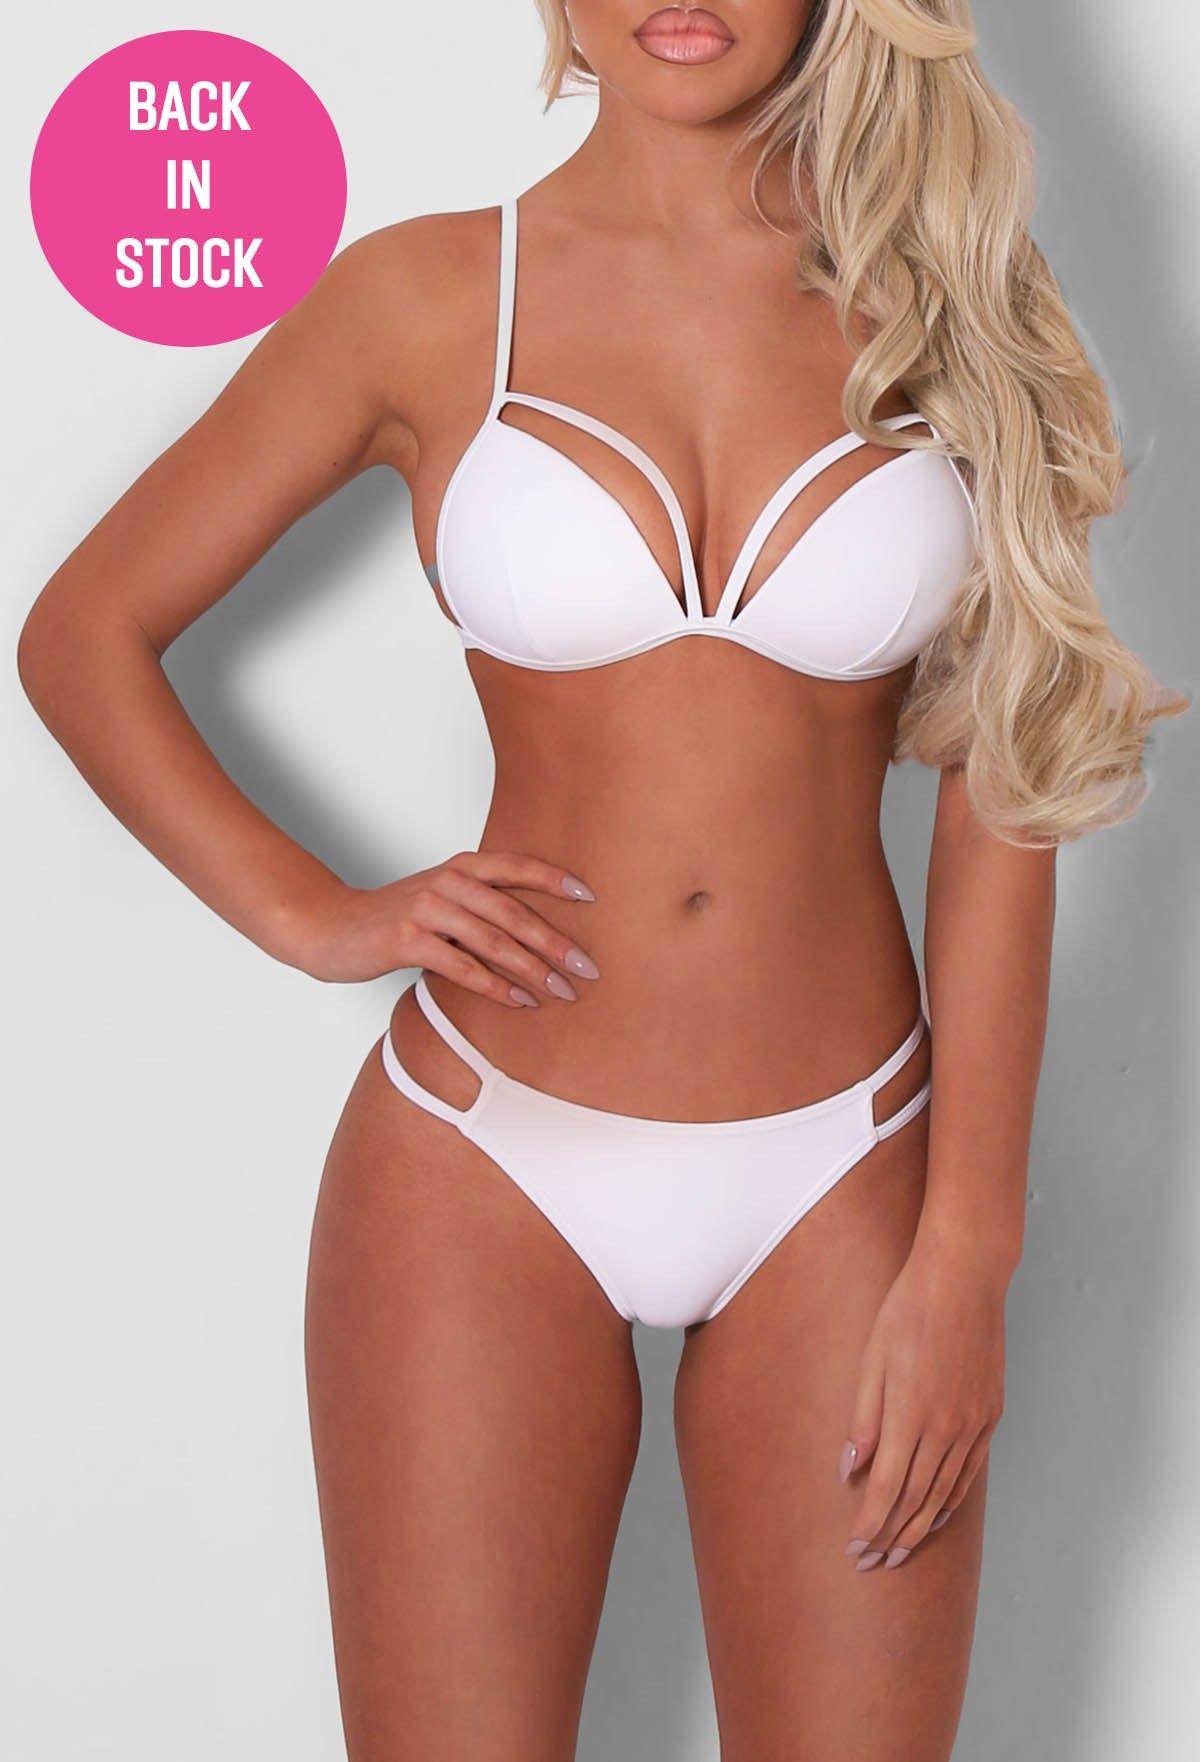 4acb617919 Audry White Strappy Bikini - 8 | swimwear | Bikinis, White bikinis ...